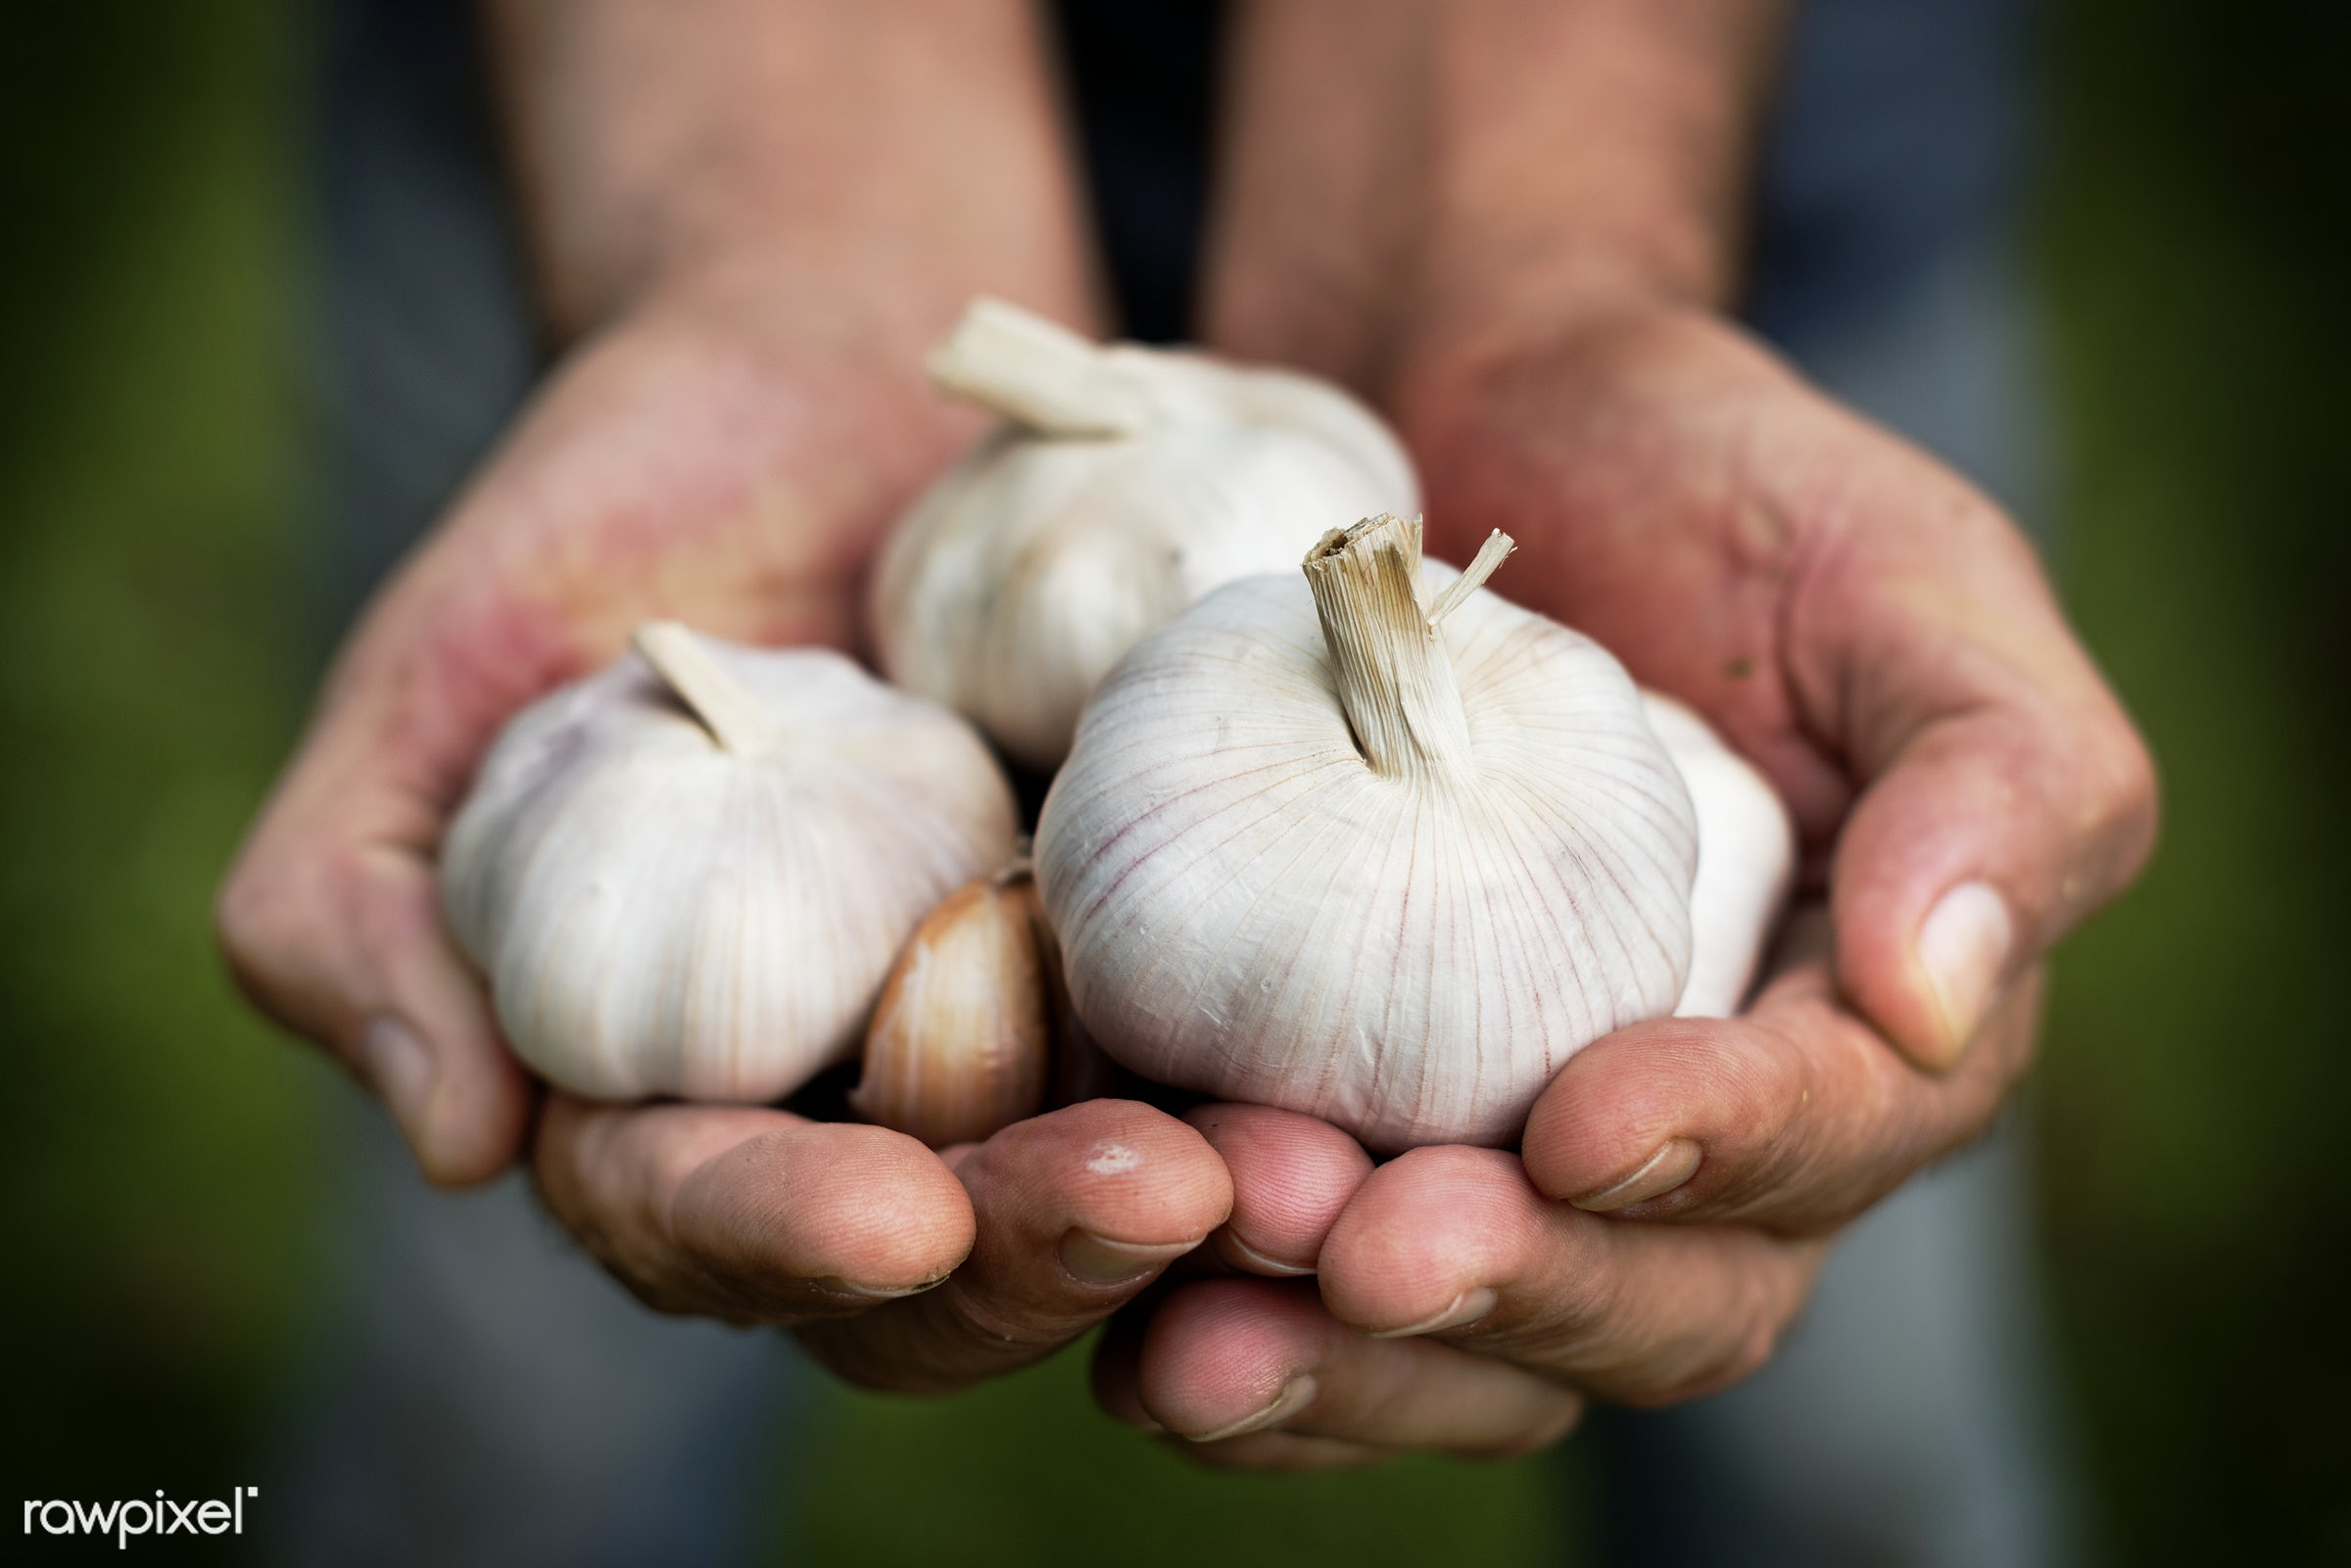 garlic, holding, seasoning, nature, hands, fresh, ingredient, closeup, gourmet, clove, flavor, organic, herb, food, healthy...